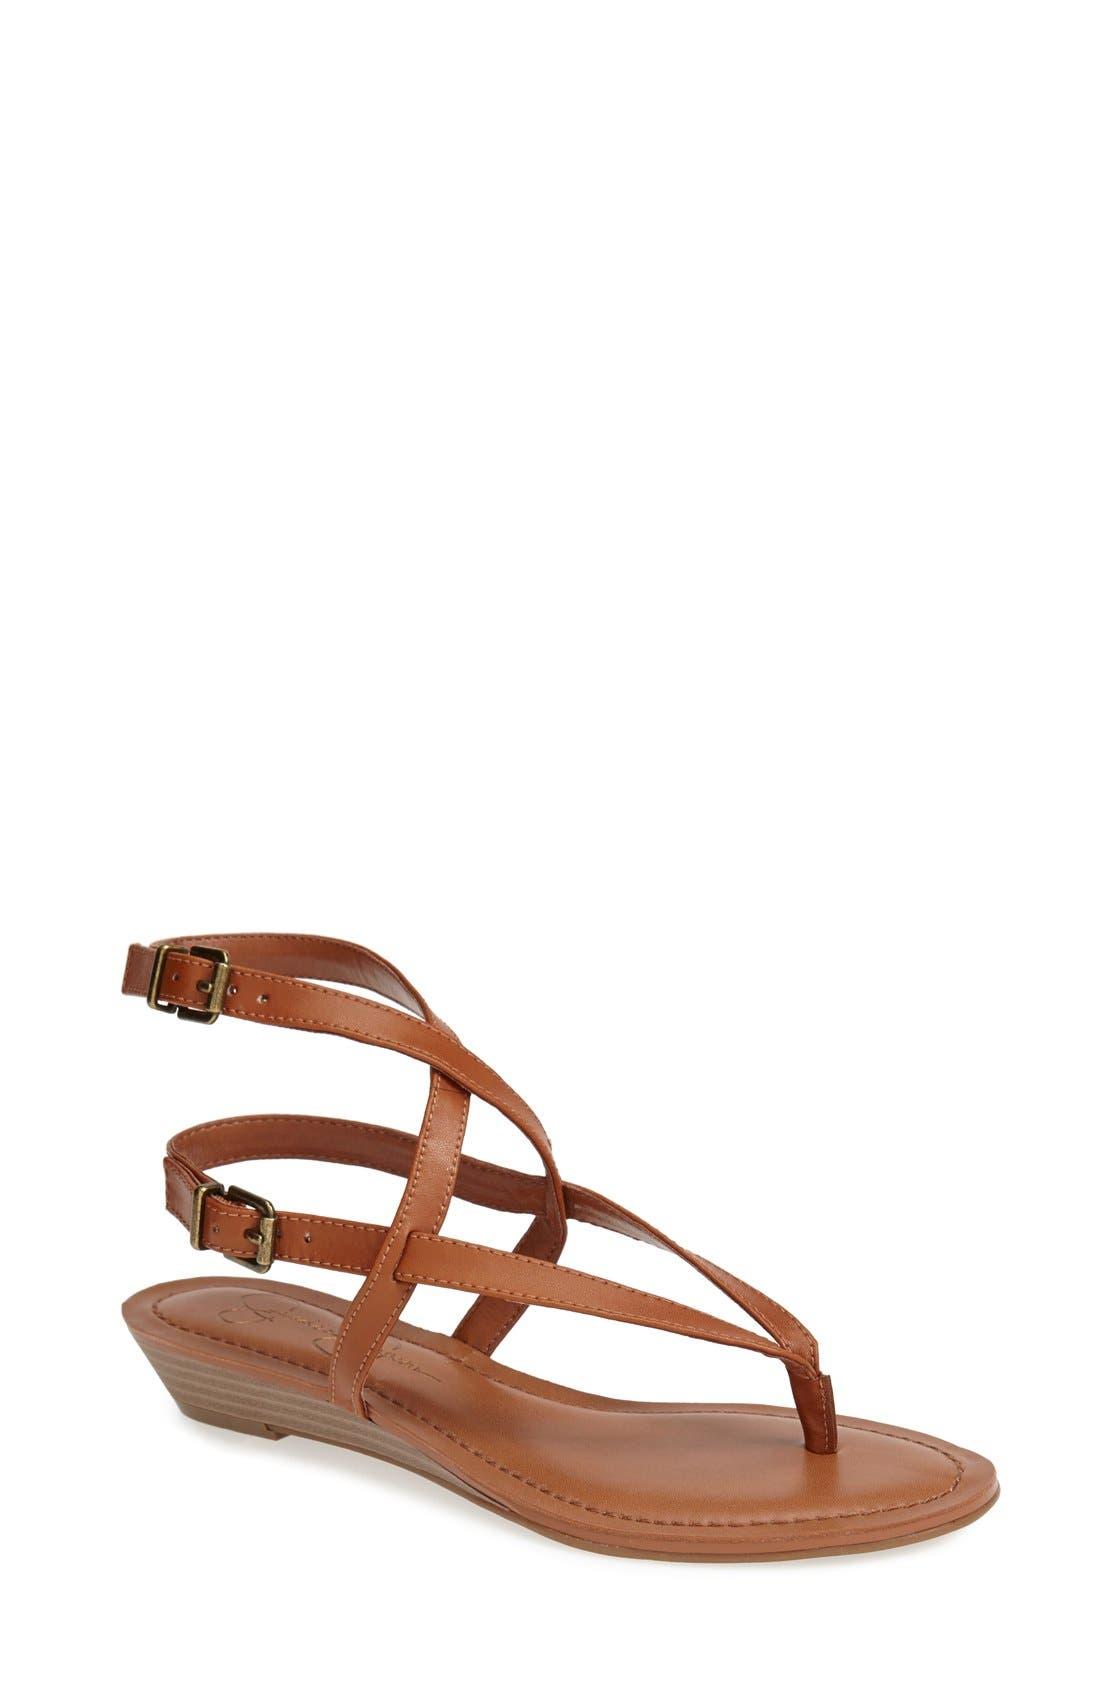 Main Image - Jessica Simpson 'Liliane' Sandal